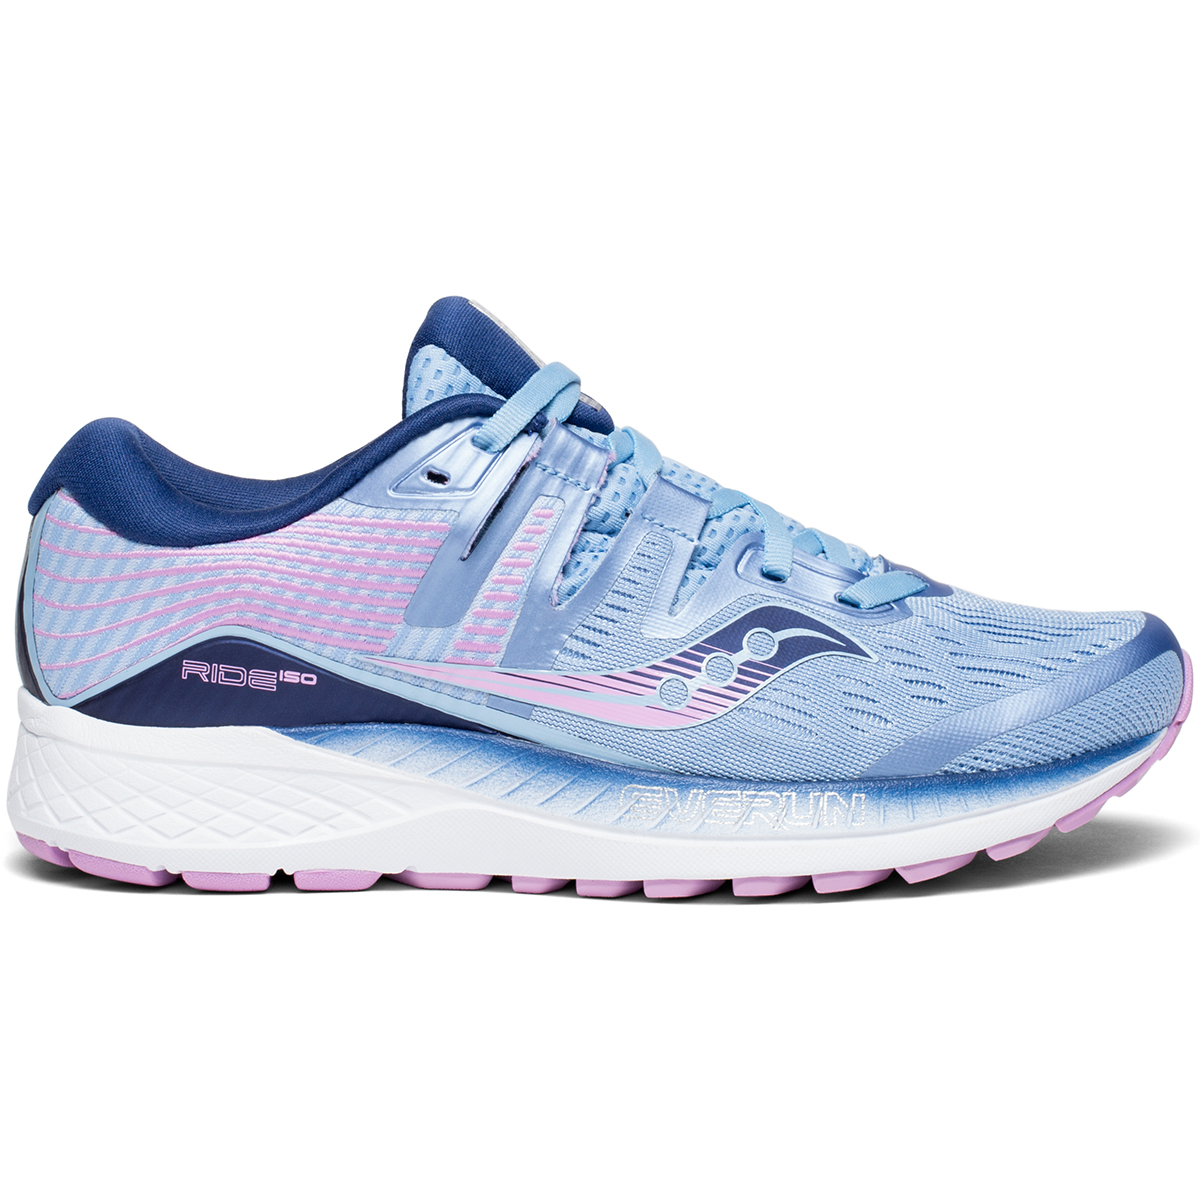 Saucony Women's Ride Iso Running Shoe - Blue, 8